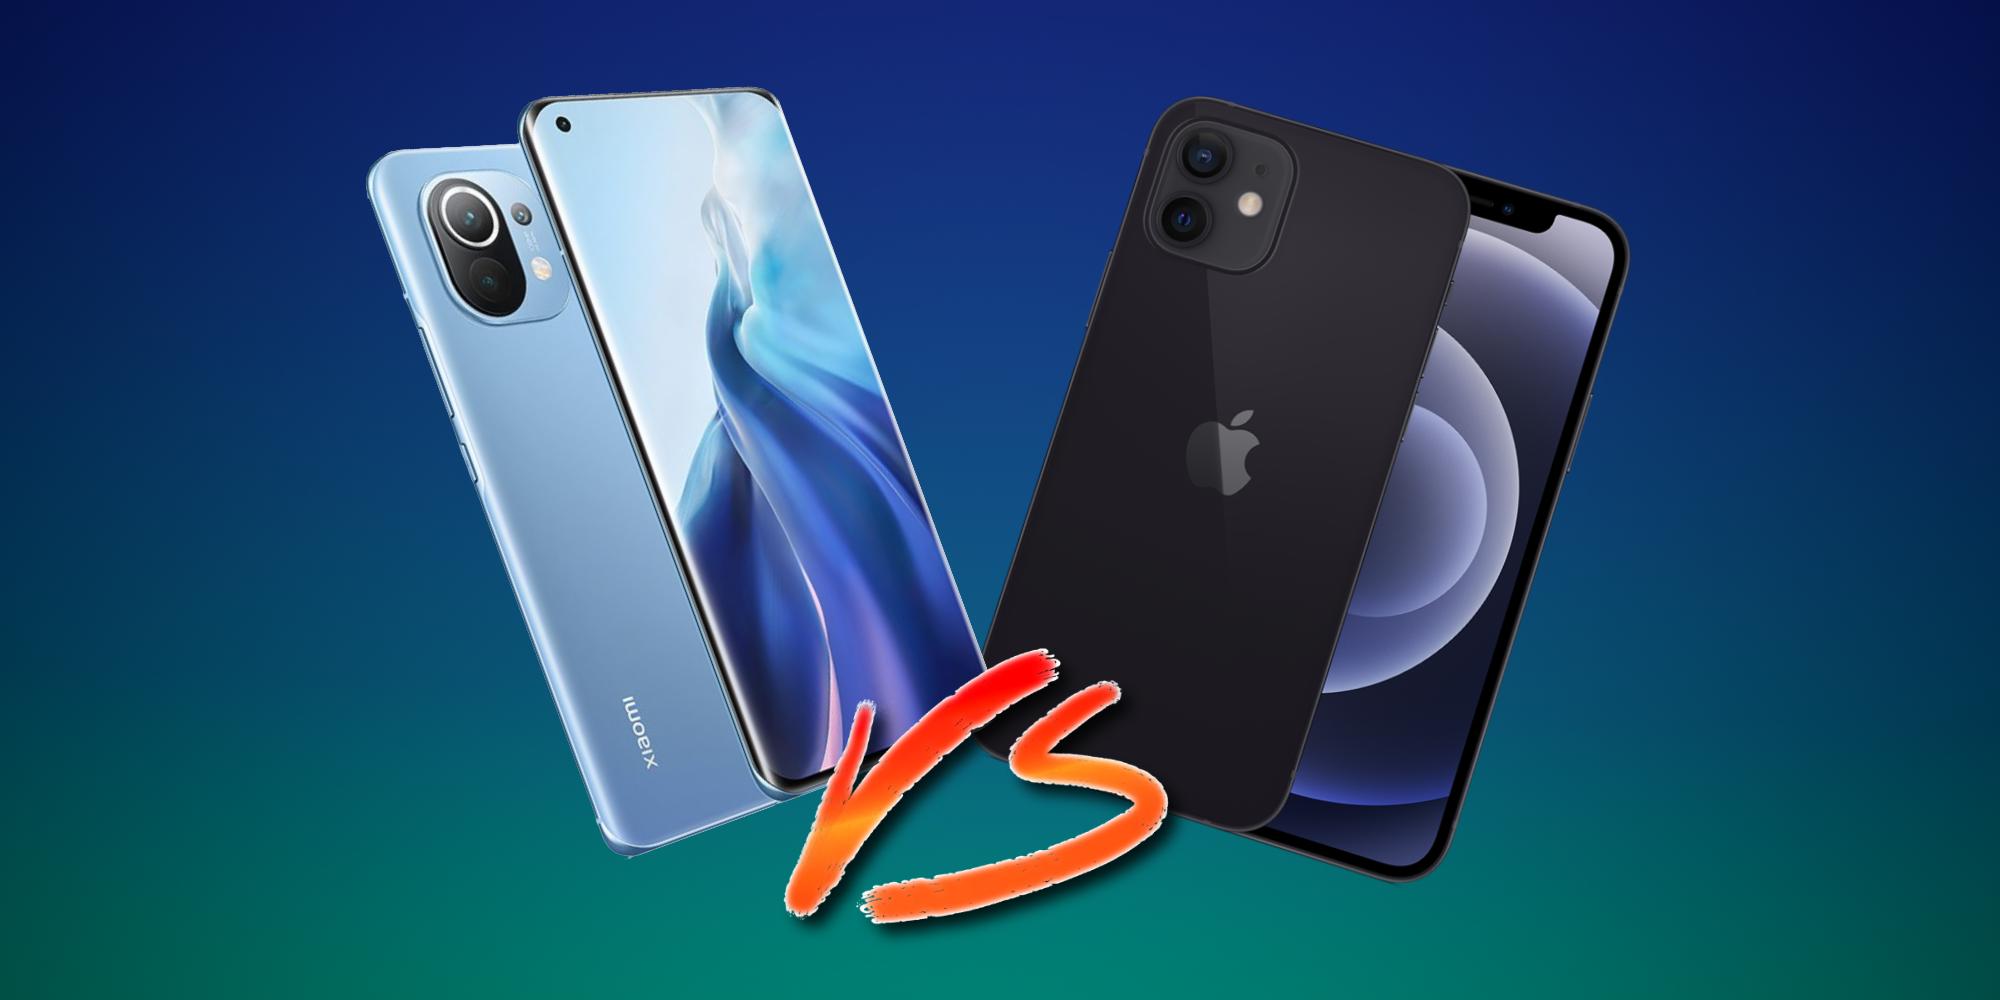 Xiaomi Mi 11 vs iPhone 12: can the underdog gain the upper hand?